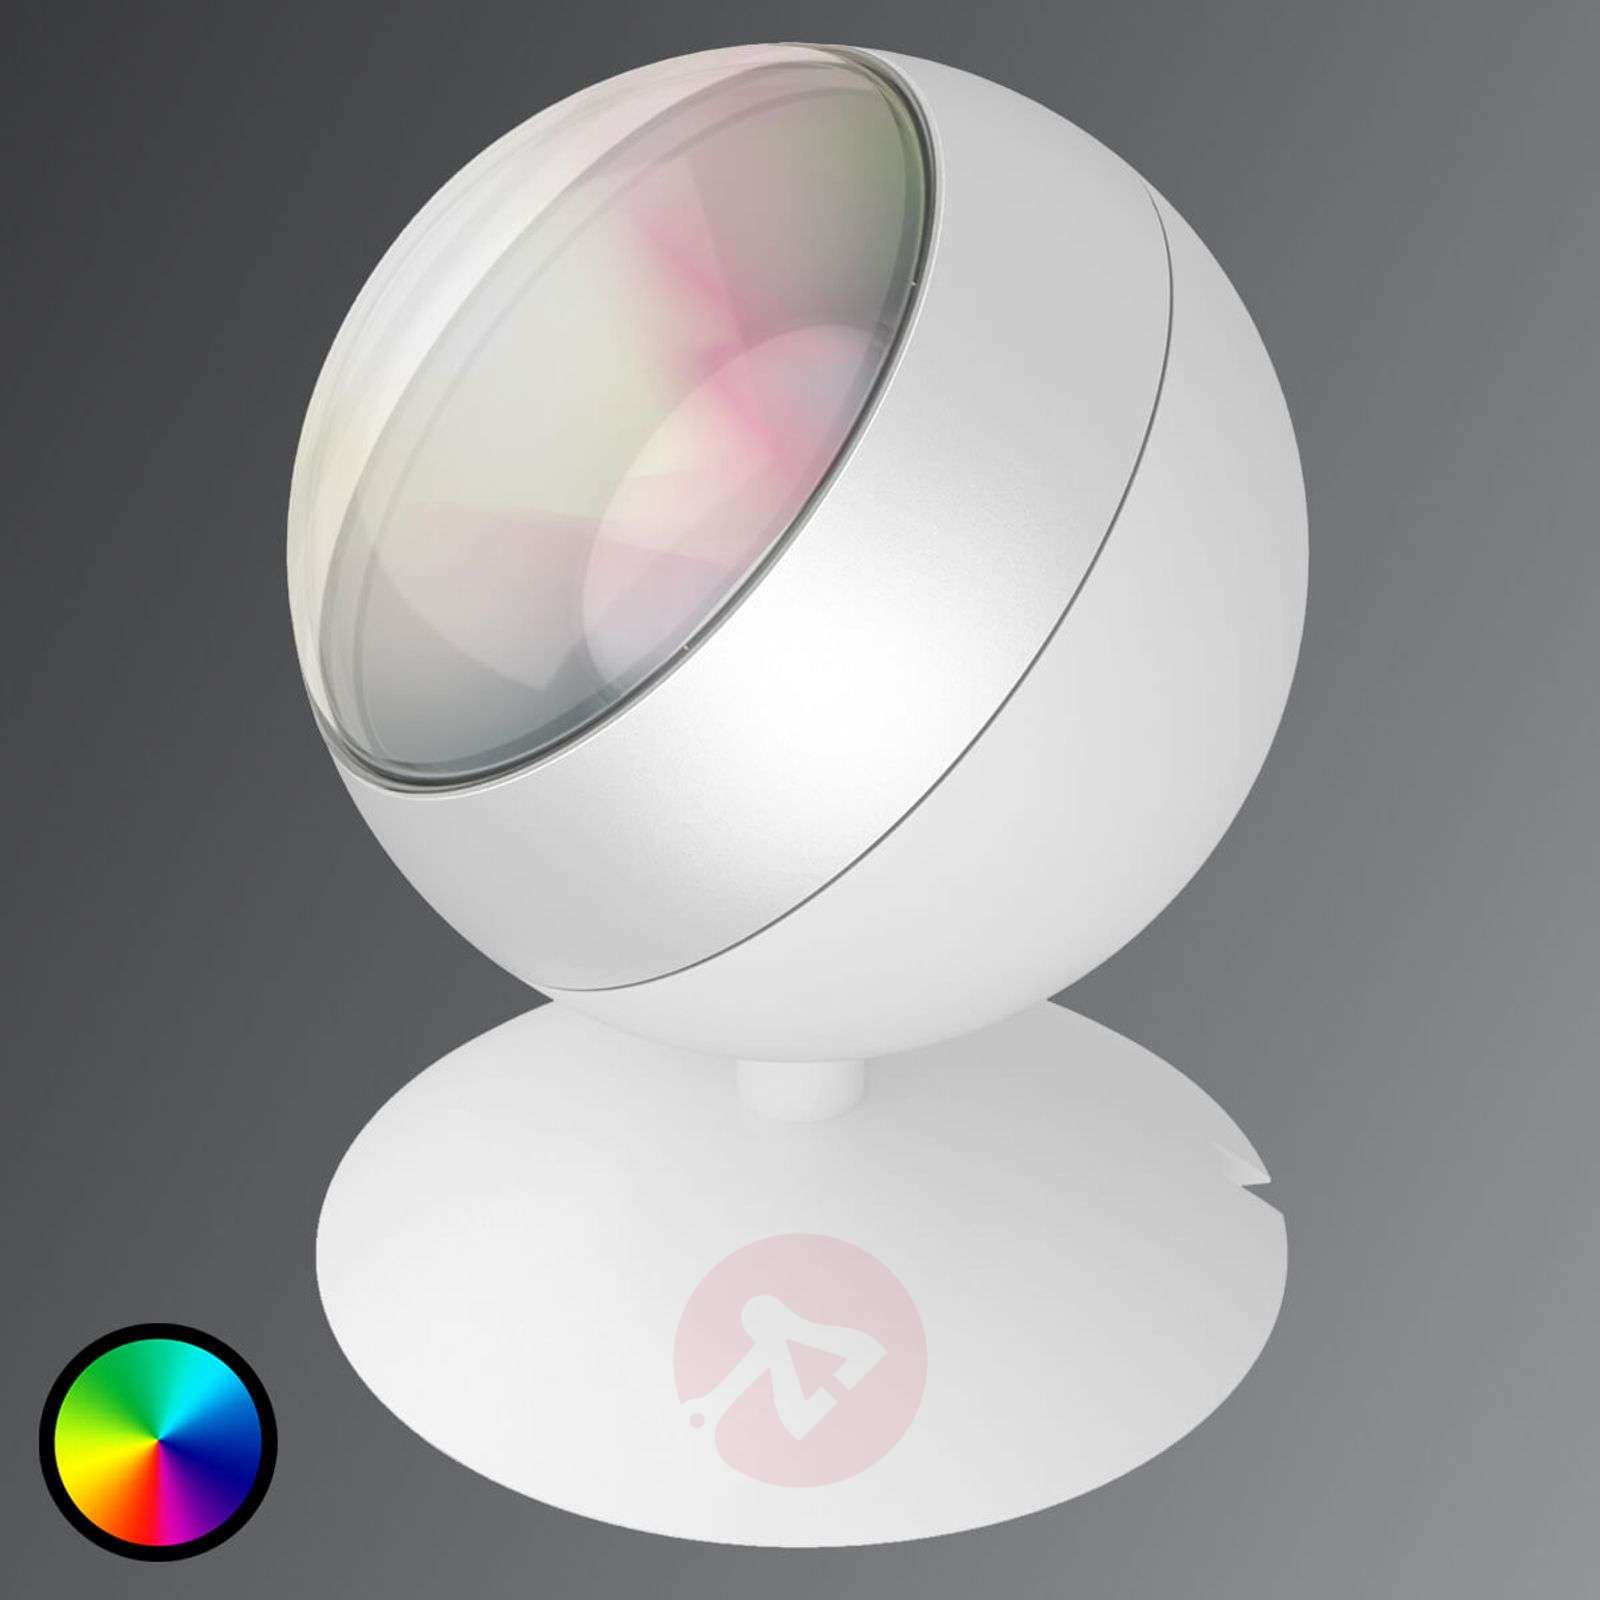 LED-pöytälamppu Quest WiZ-teknologialla, valkoinen-9038091-01